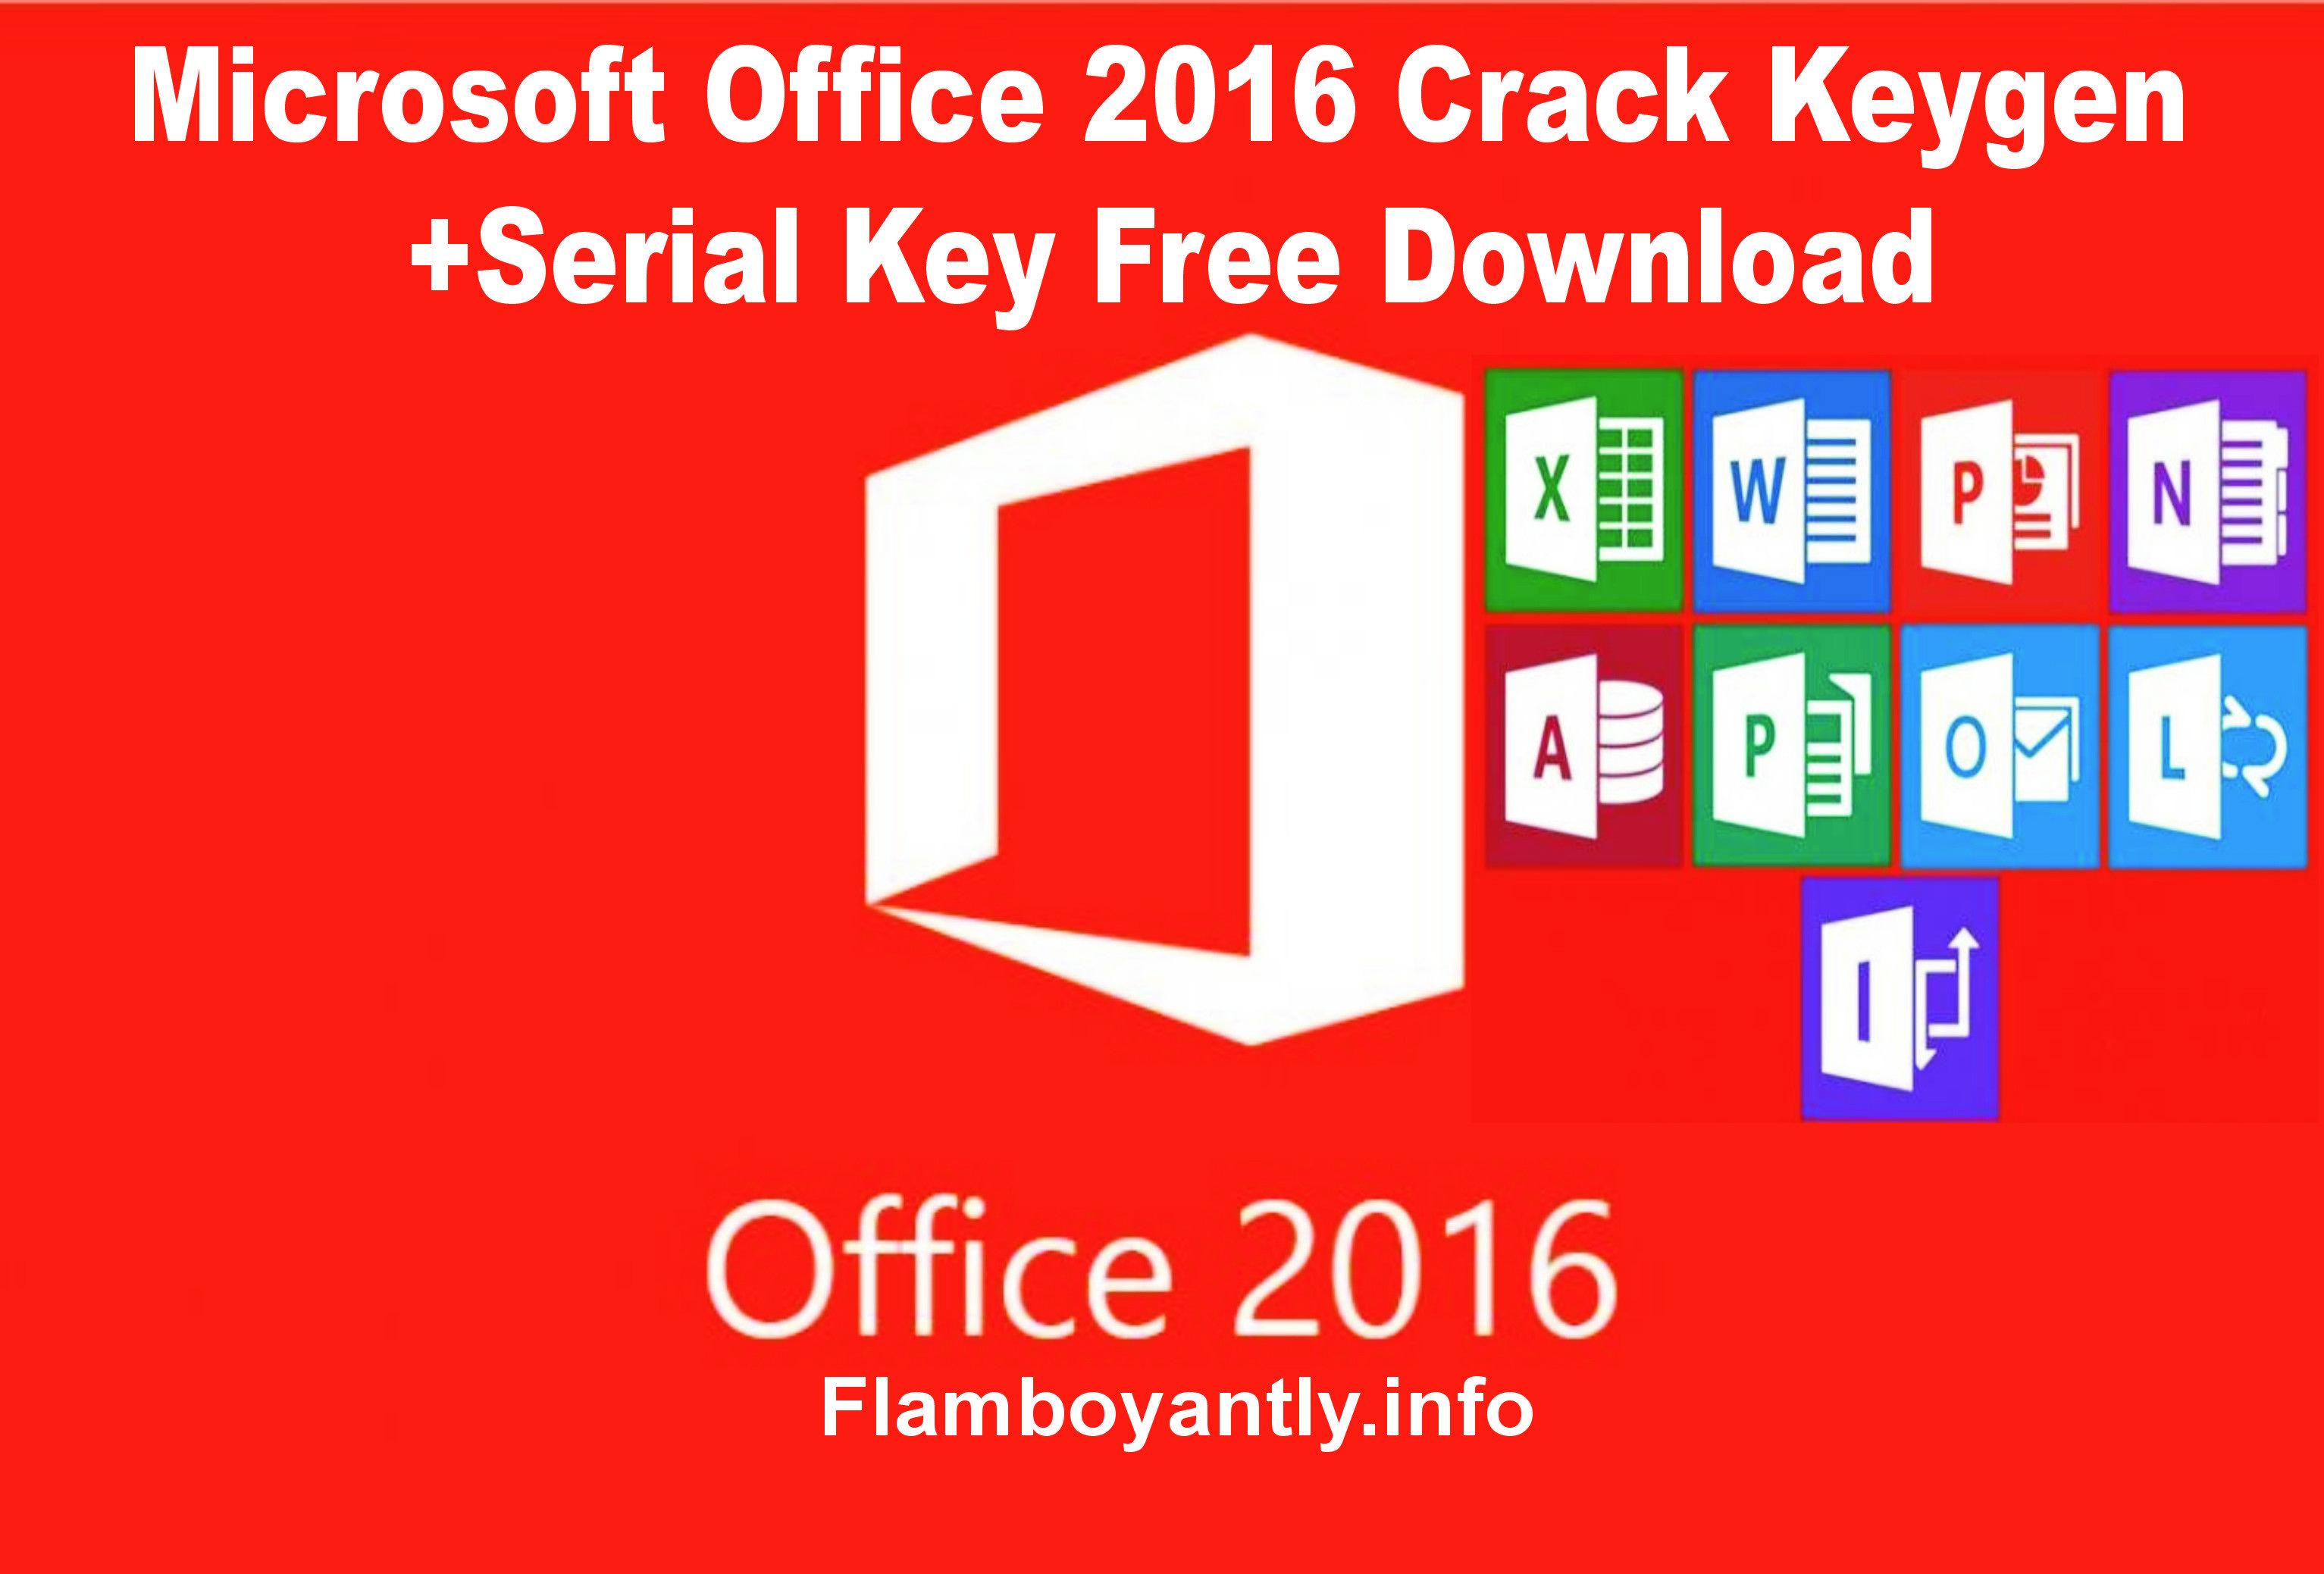 microsoft office 2016 crack reddit